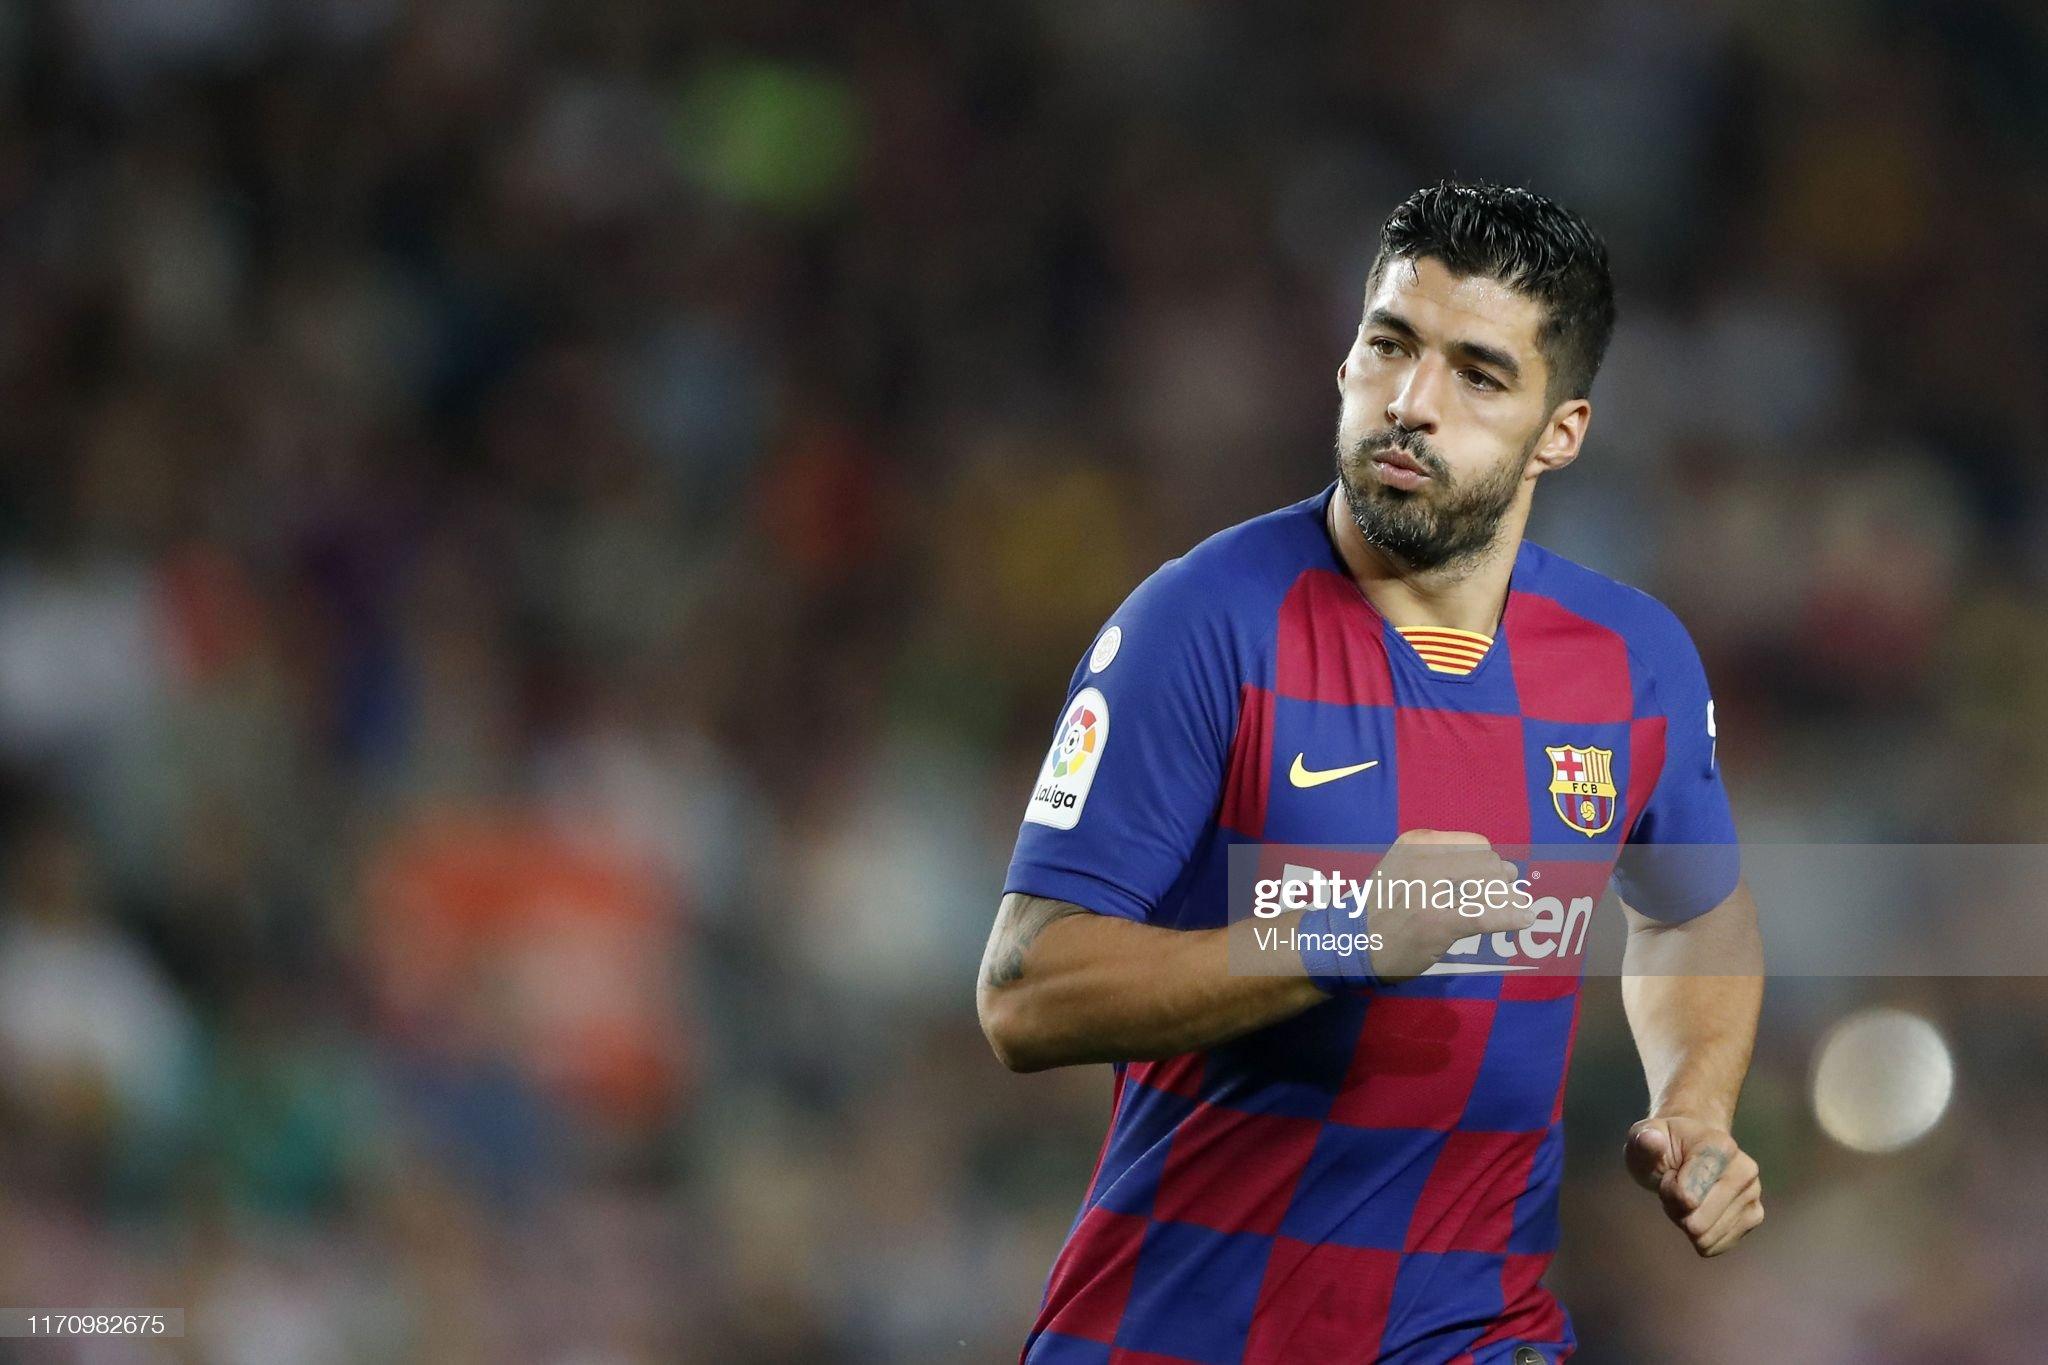 صور مباراة : برشلونة - فياريال 2-1 ( 24-09-2019 )  Luis-suarez-of-fc-barcelona-during-the-laliga-santander-match-between-picture-id1170982675?s=2048x2048